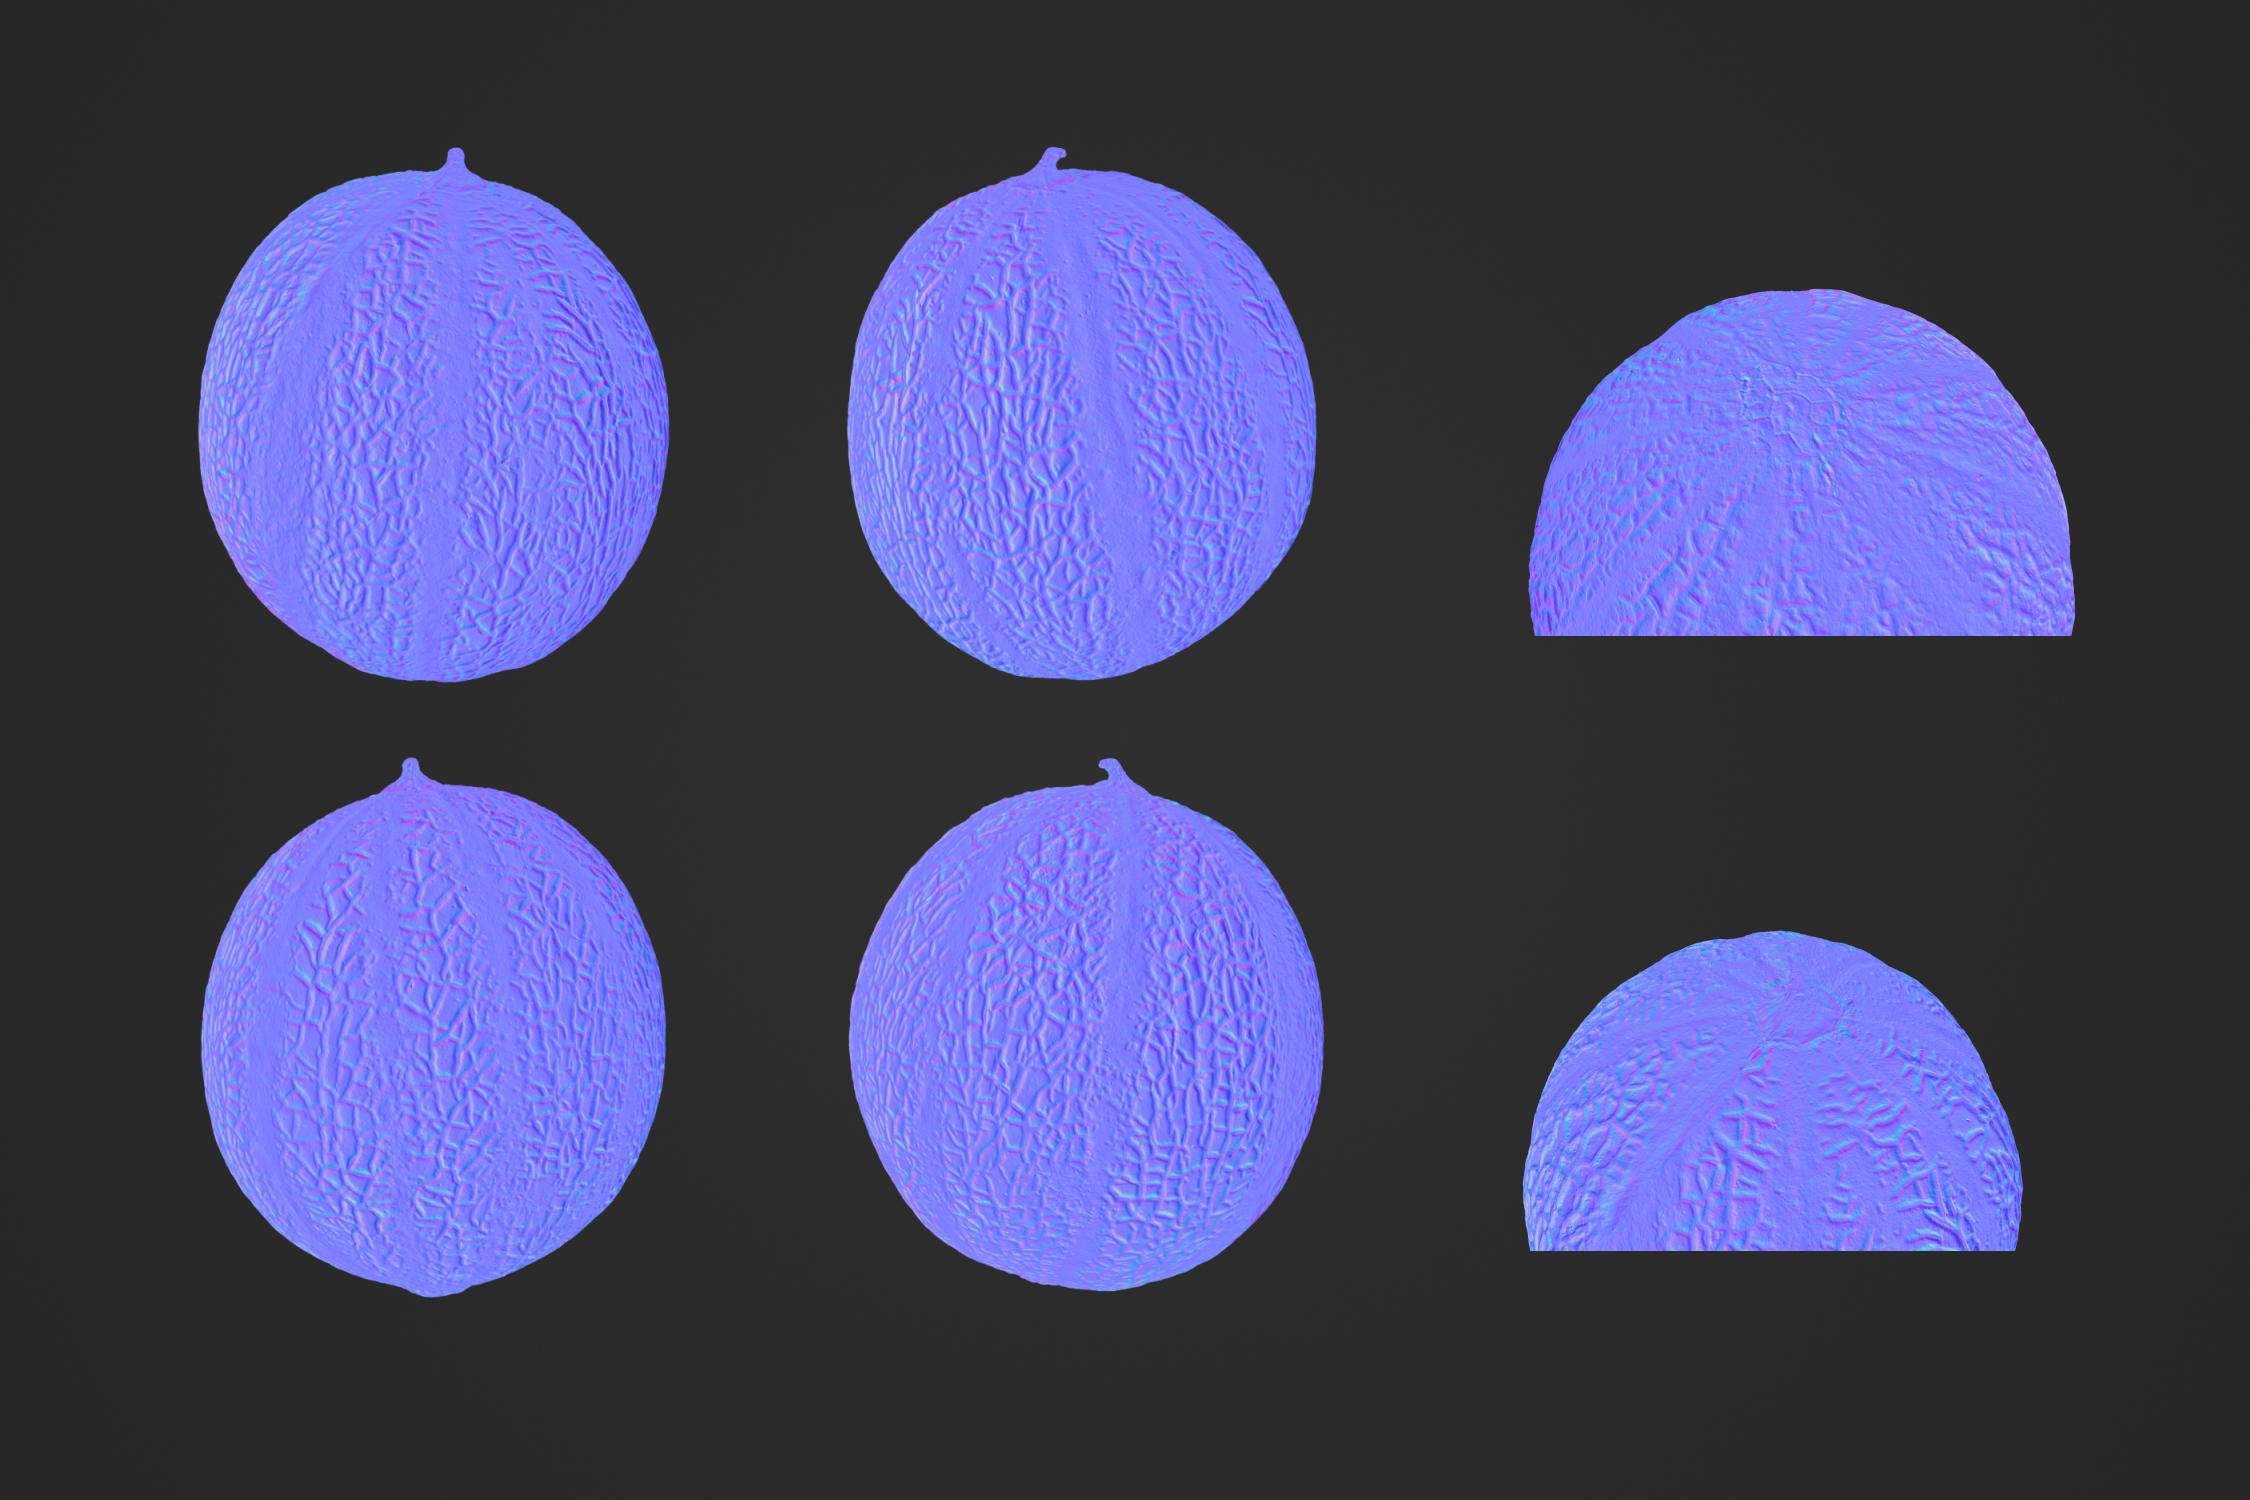 Melon_1_3.jpg